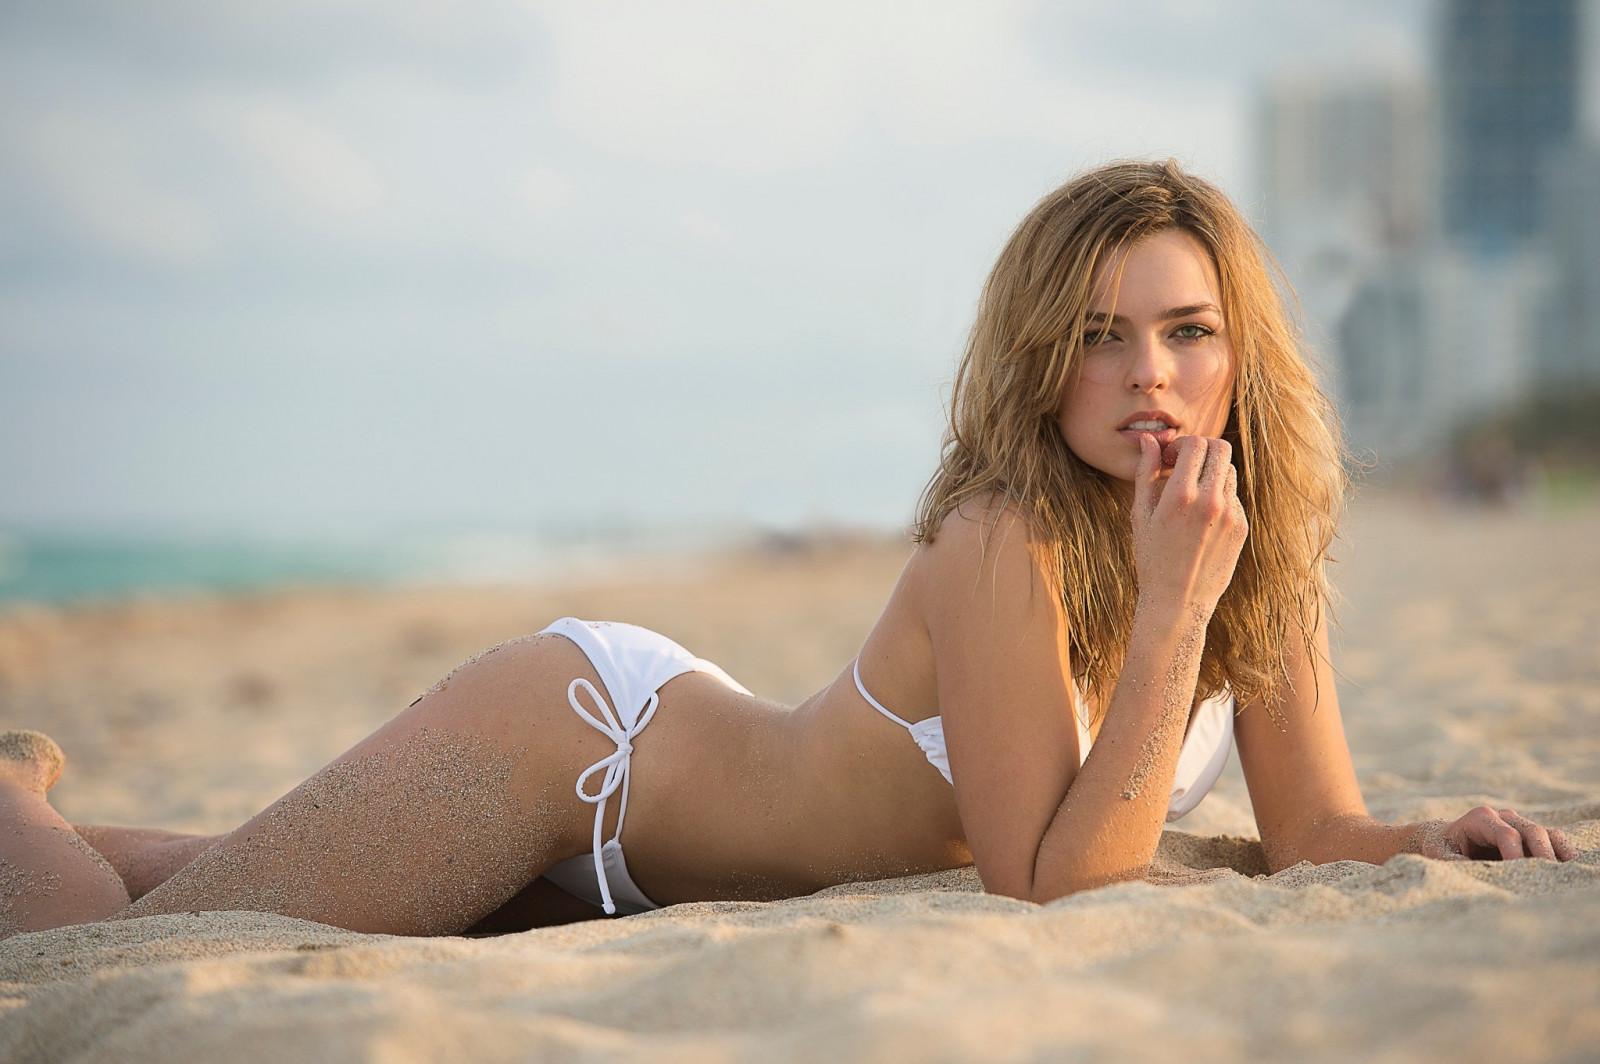 girls-in-bikini-photos-strong